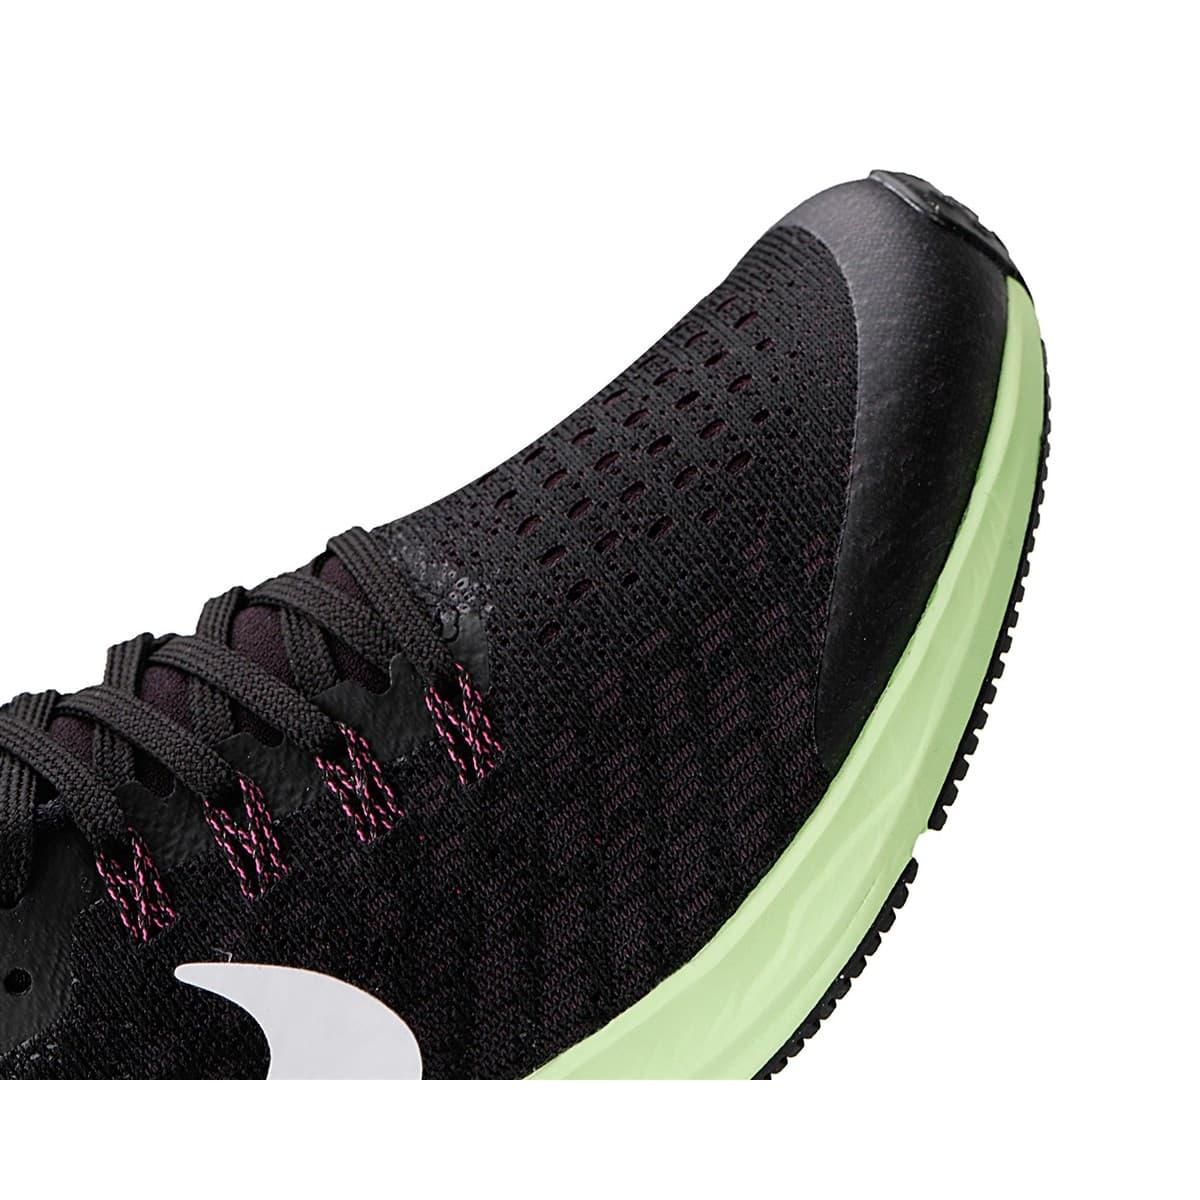 Air Zoom Pegasus 35 Siyah Yeşil Koşu Ayakkabısı